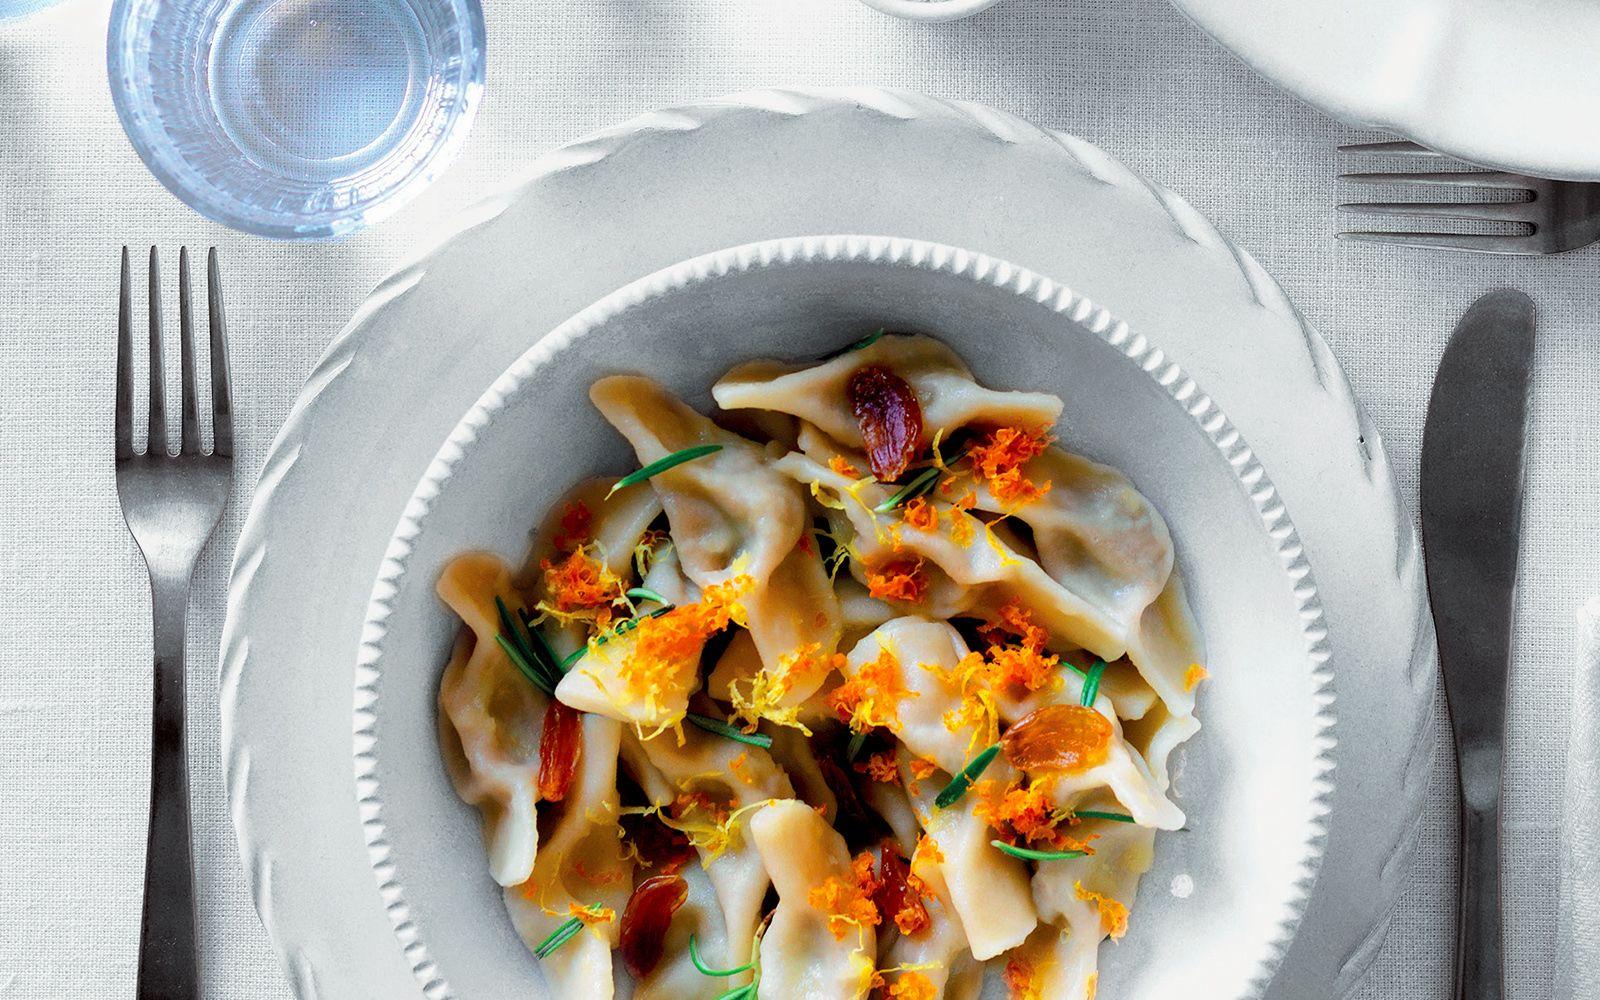 Ricetta Ravioli Vegan.Ricetta Casoncelli Vegani La Cucina Italiana Recipe Italian Recipes Recipes Cooking